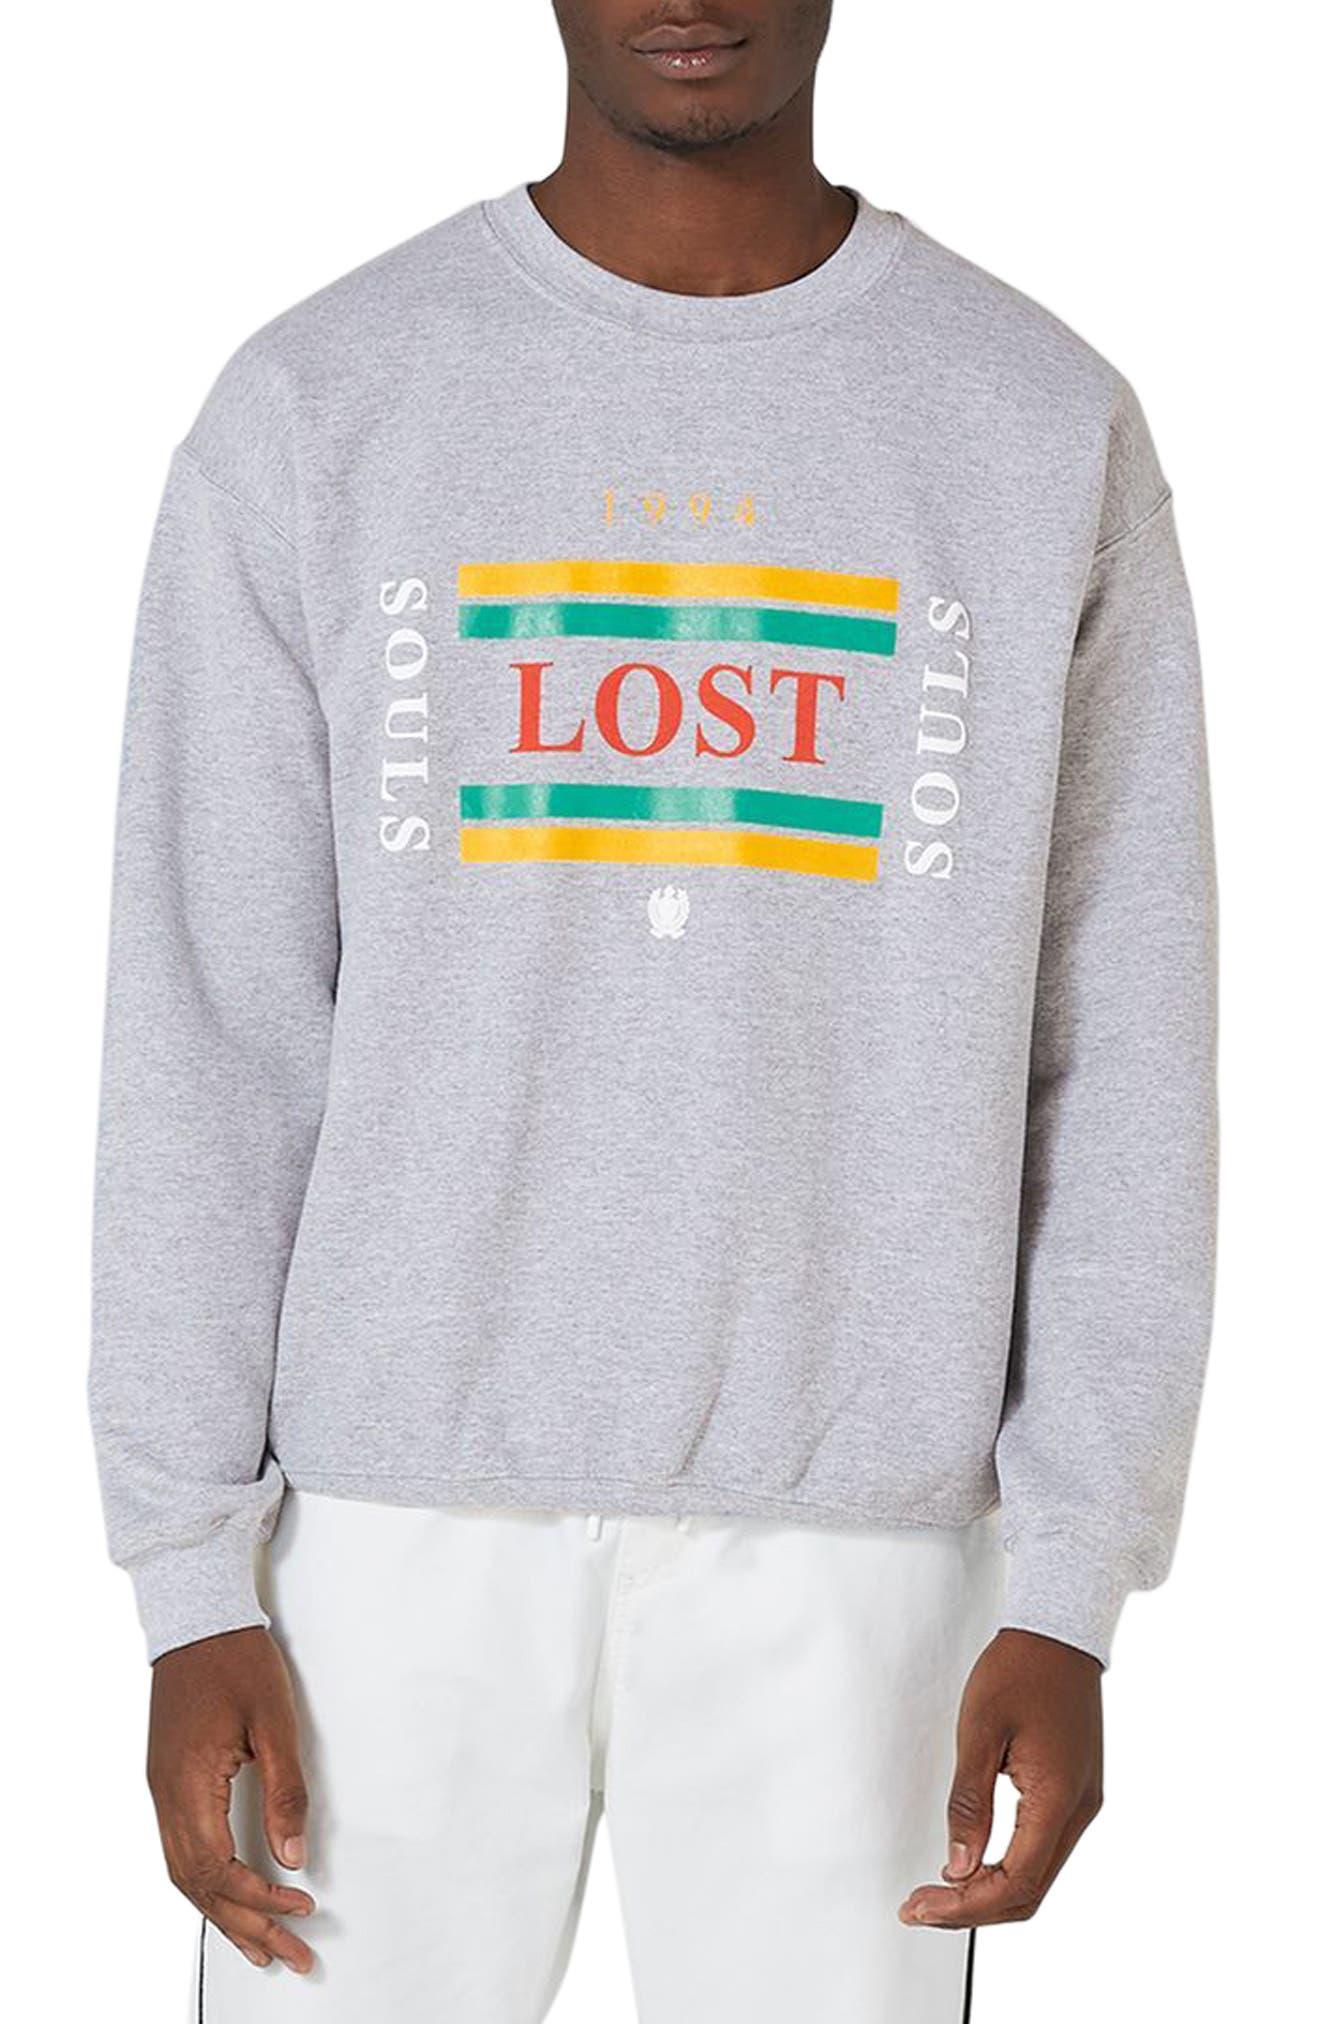 Lost Souls Graphic Sweatshirt,                         Main,                         color, Light Grey